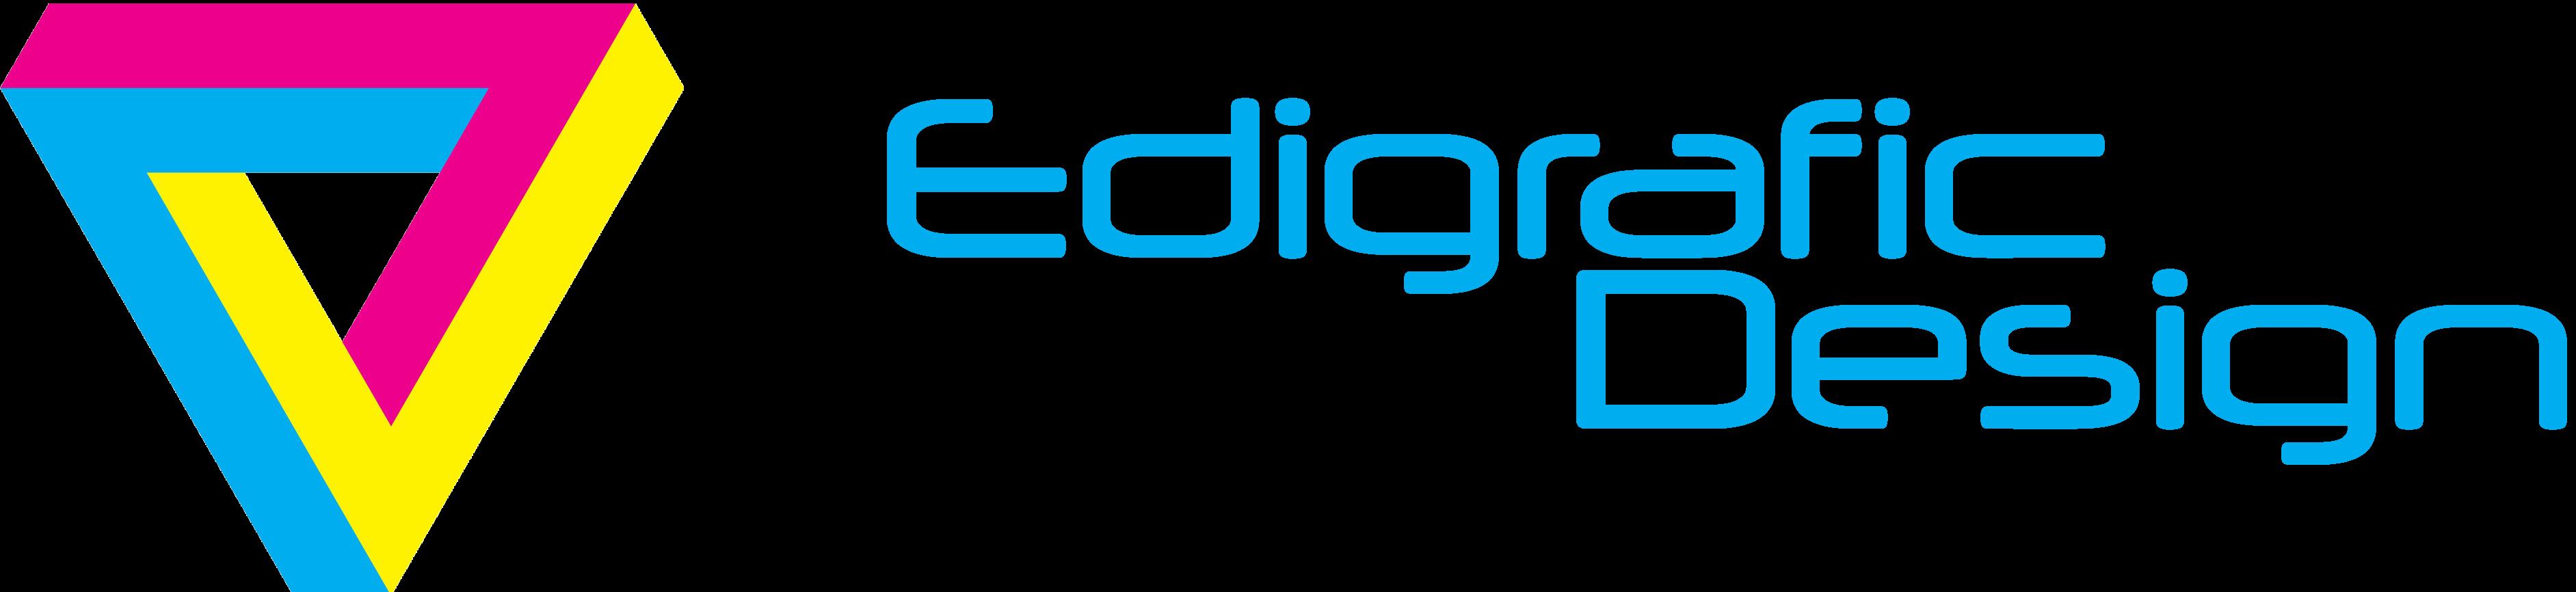 Edigrafic Design